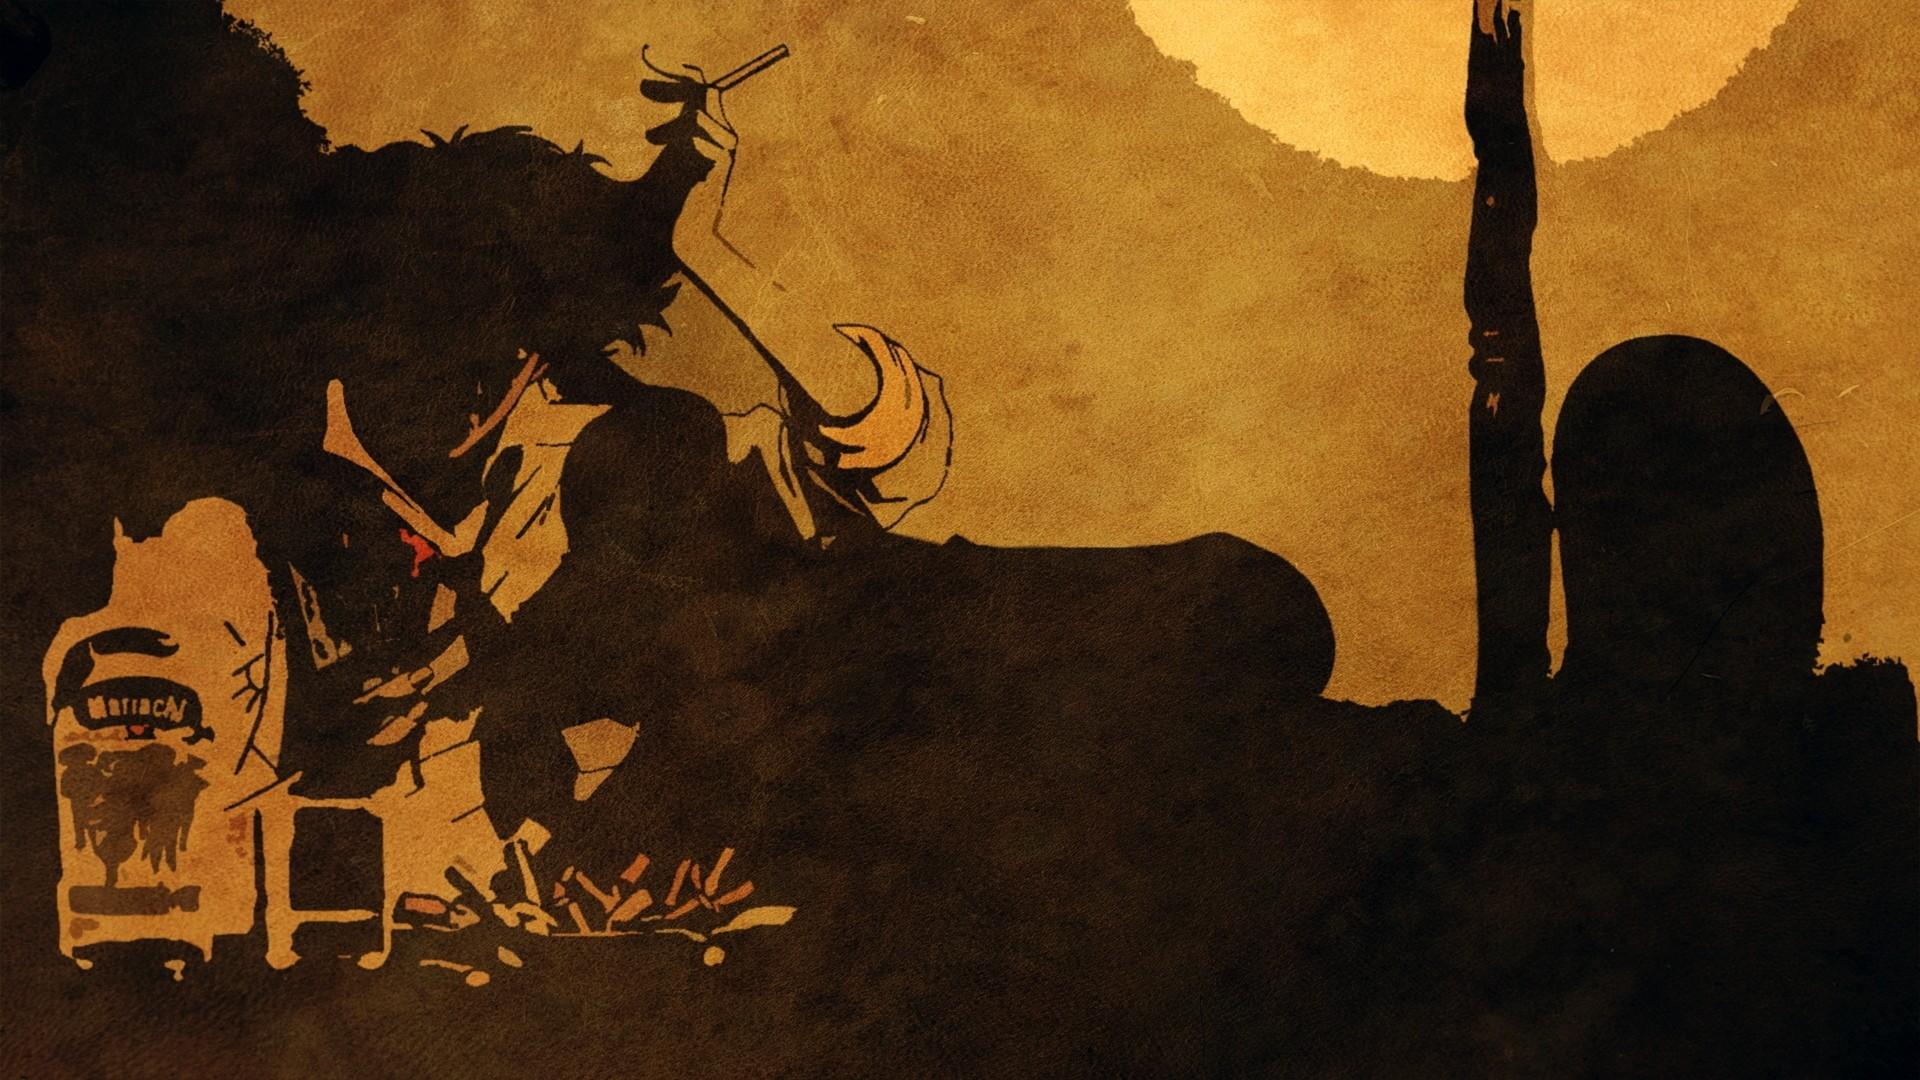 Cowboy Bebop Background Wallpaper